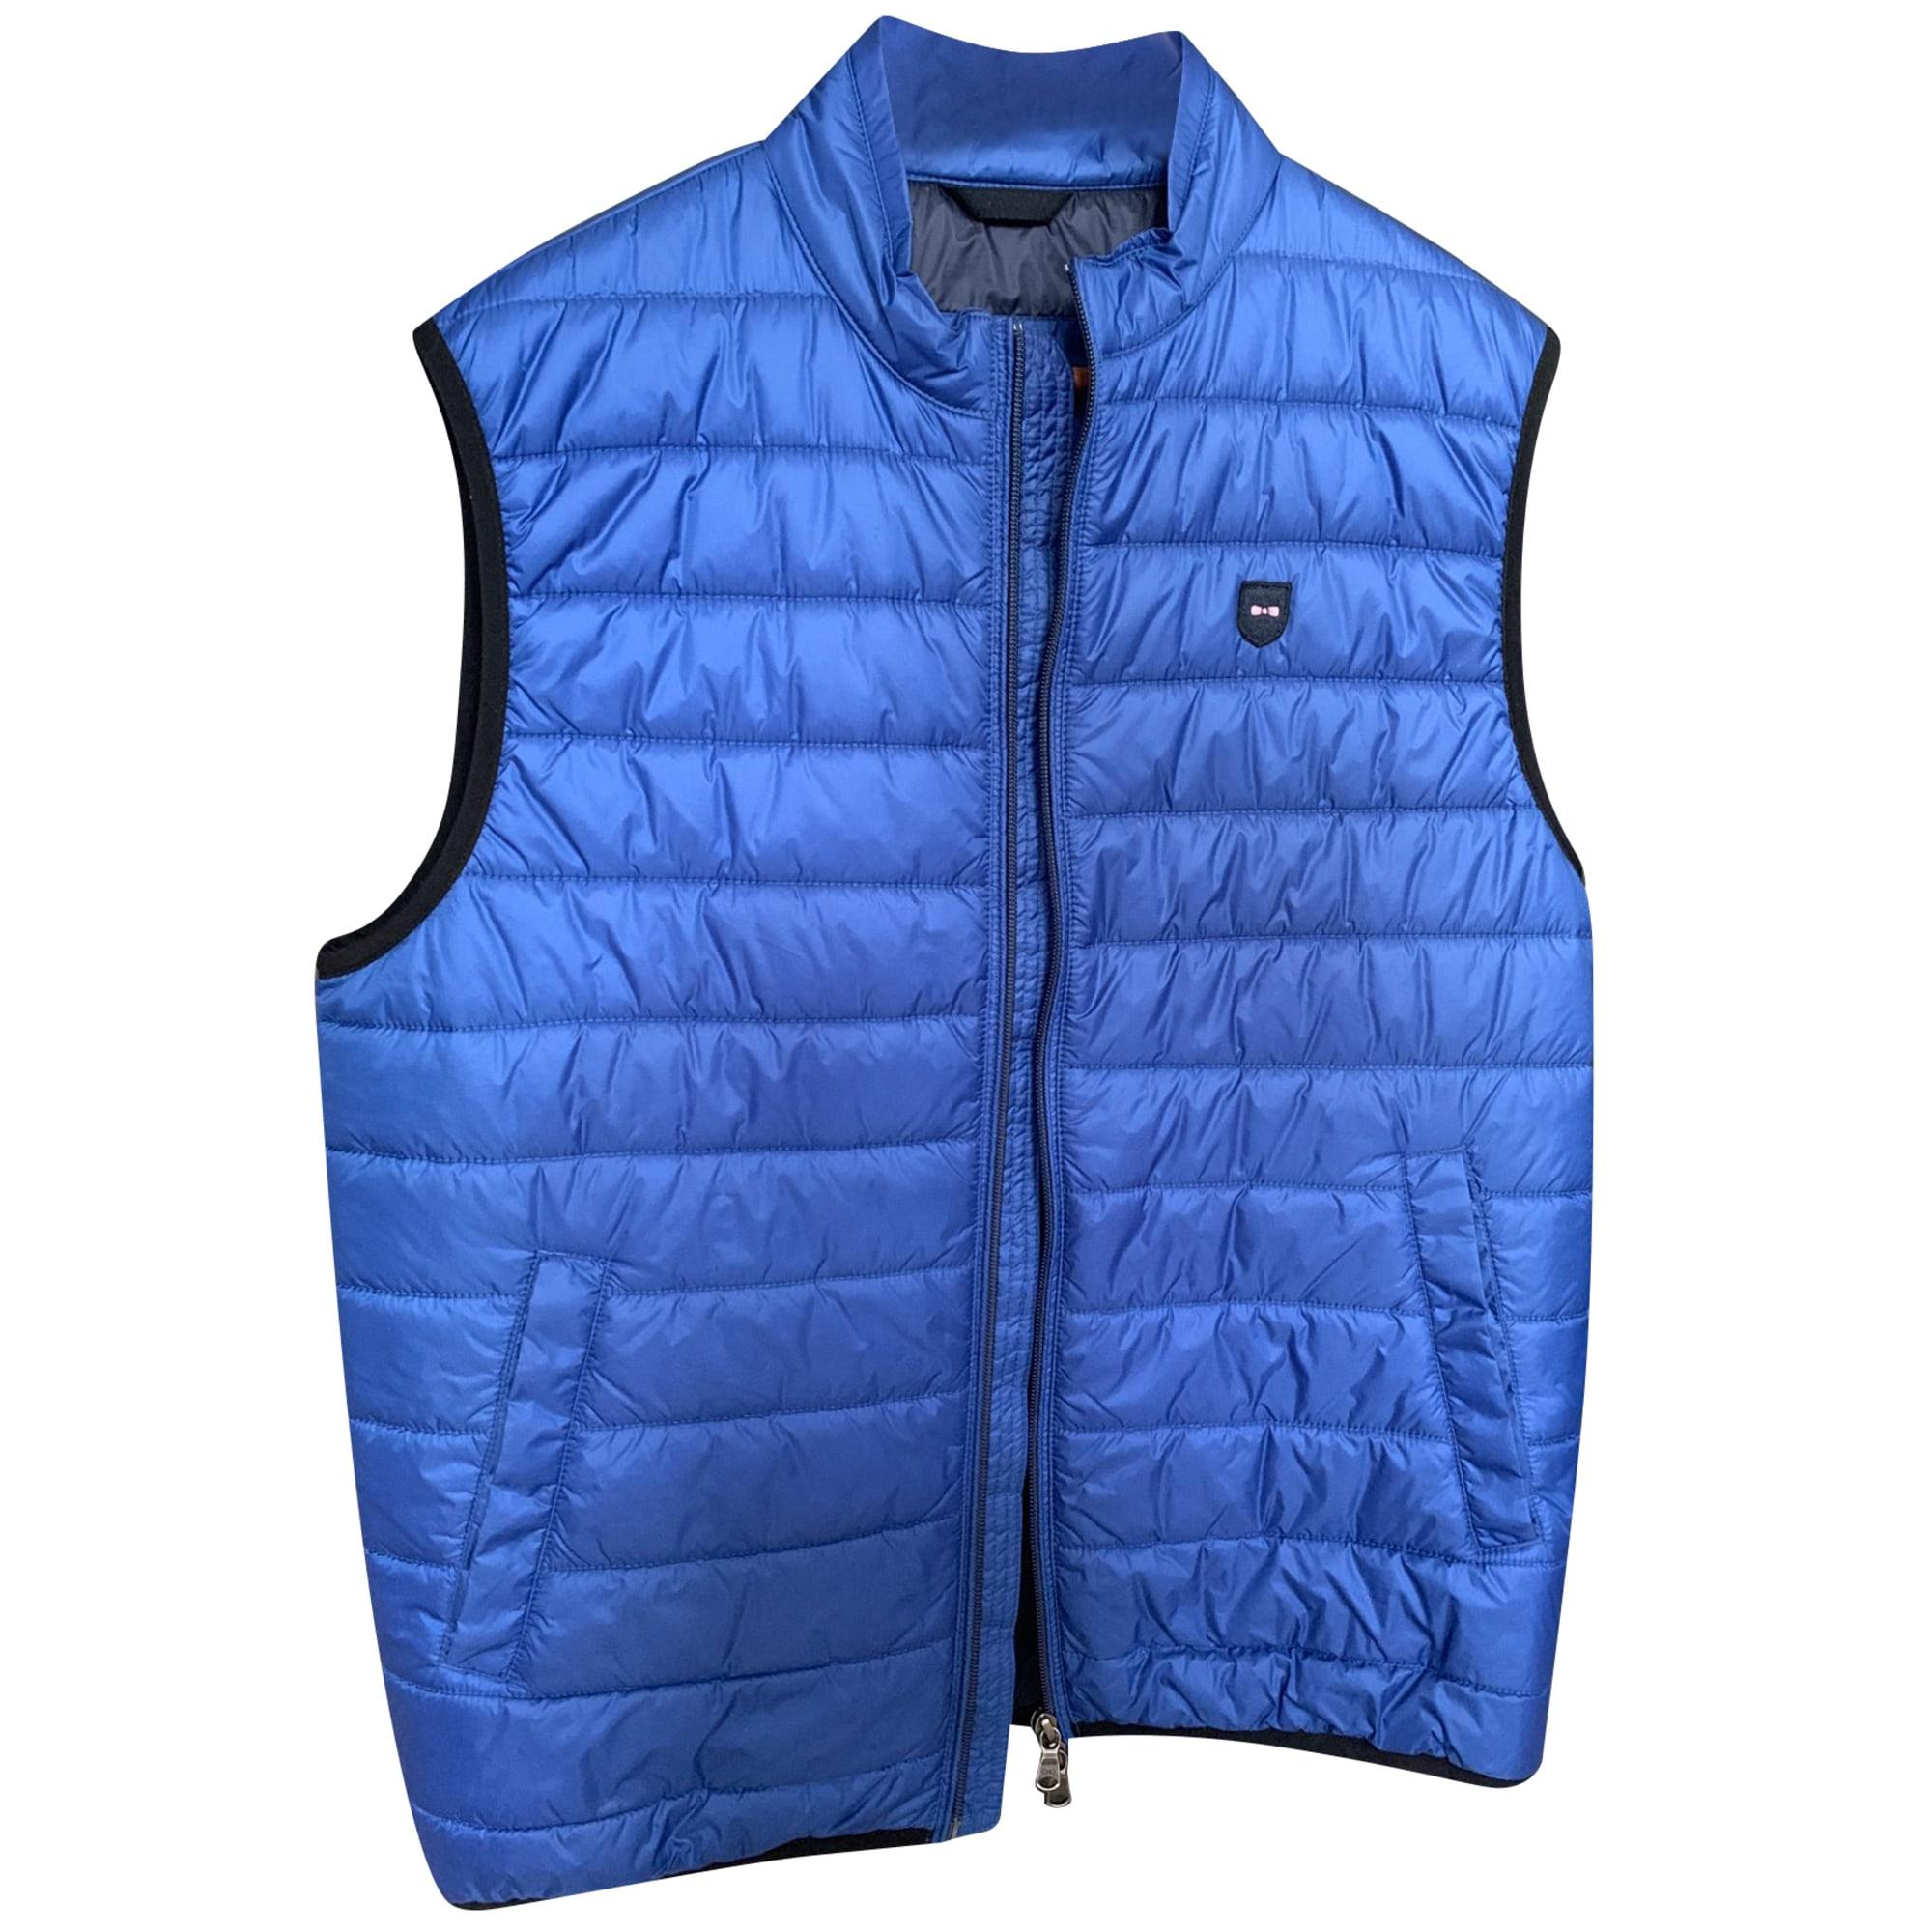 Doudoune EDEN PARK Bleu, bleu marine, bleu turquoise